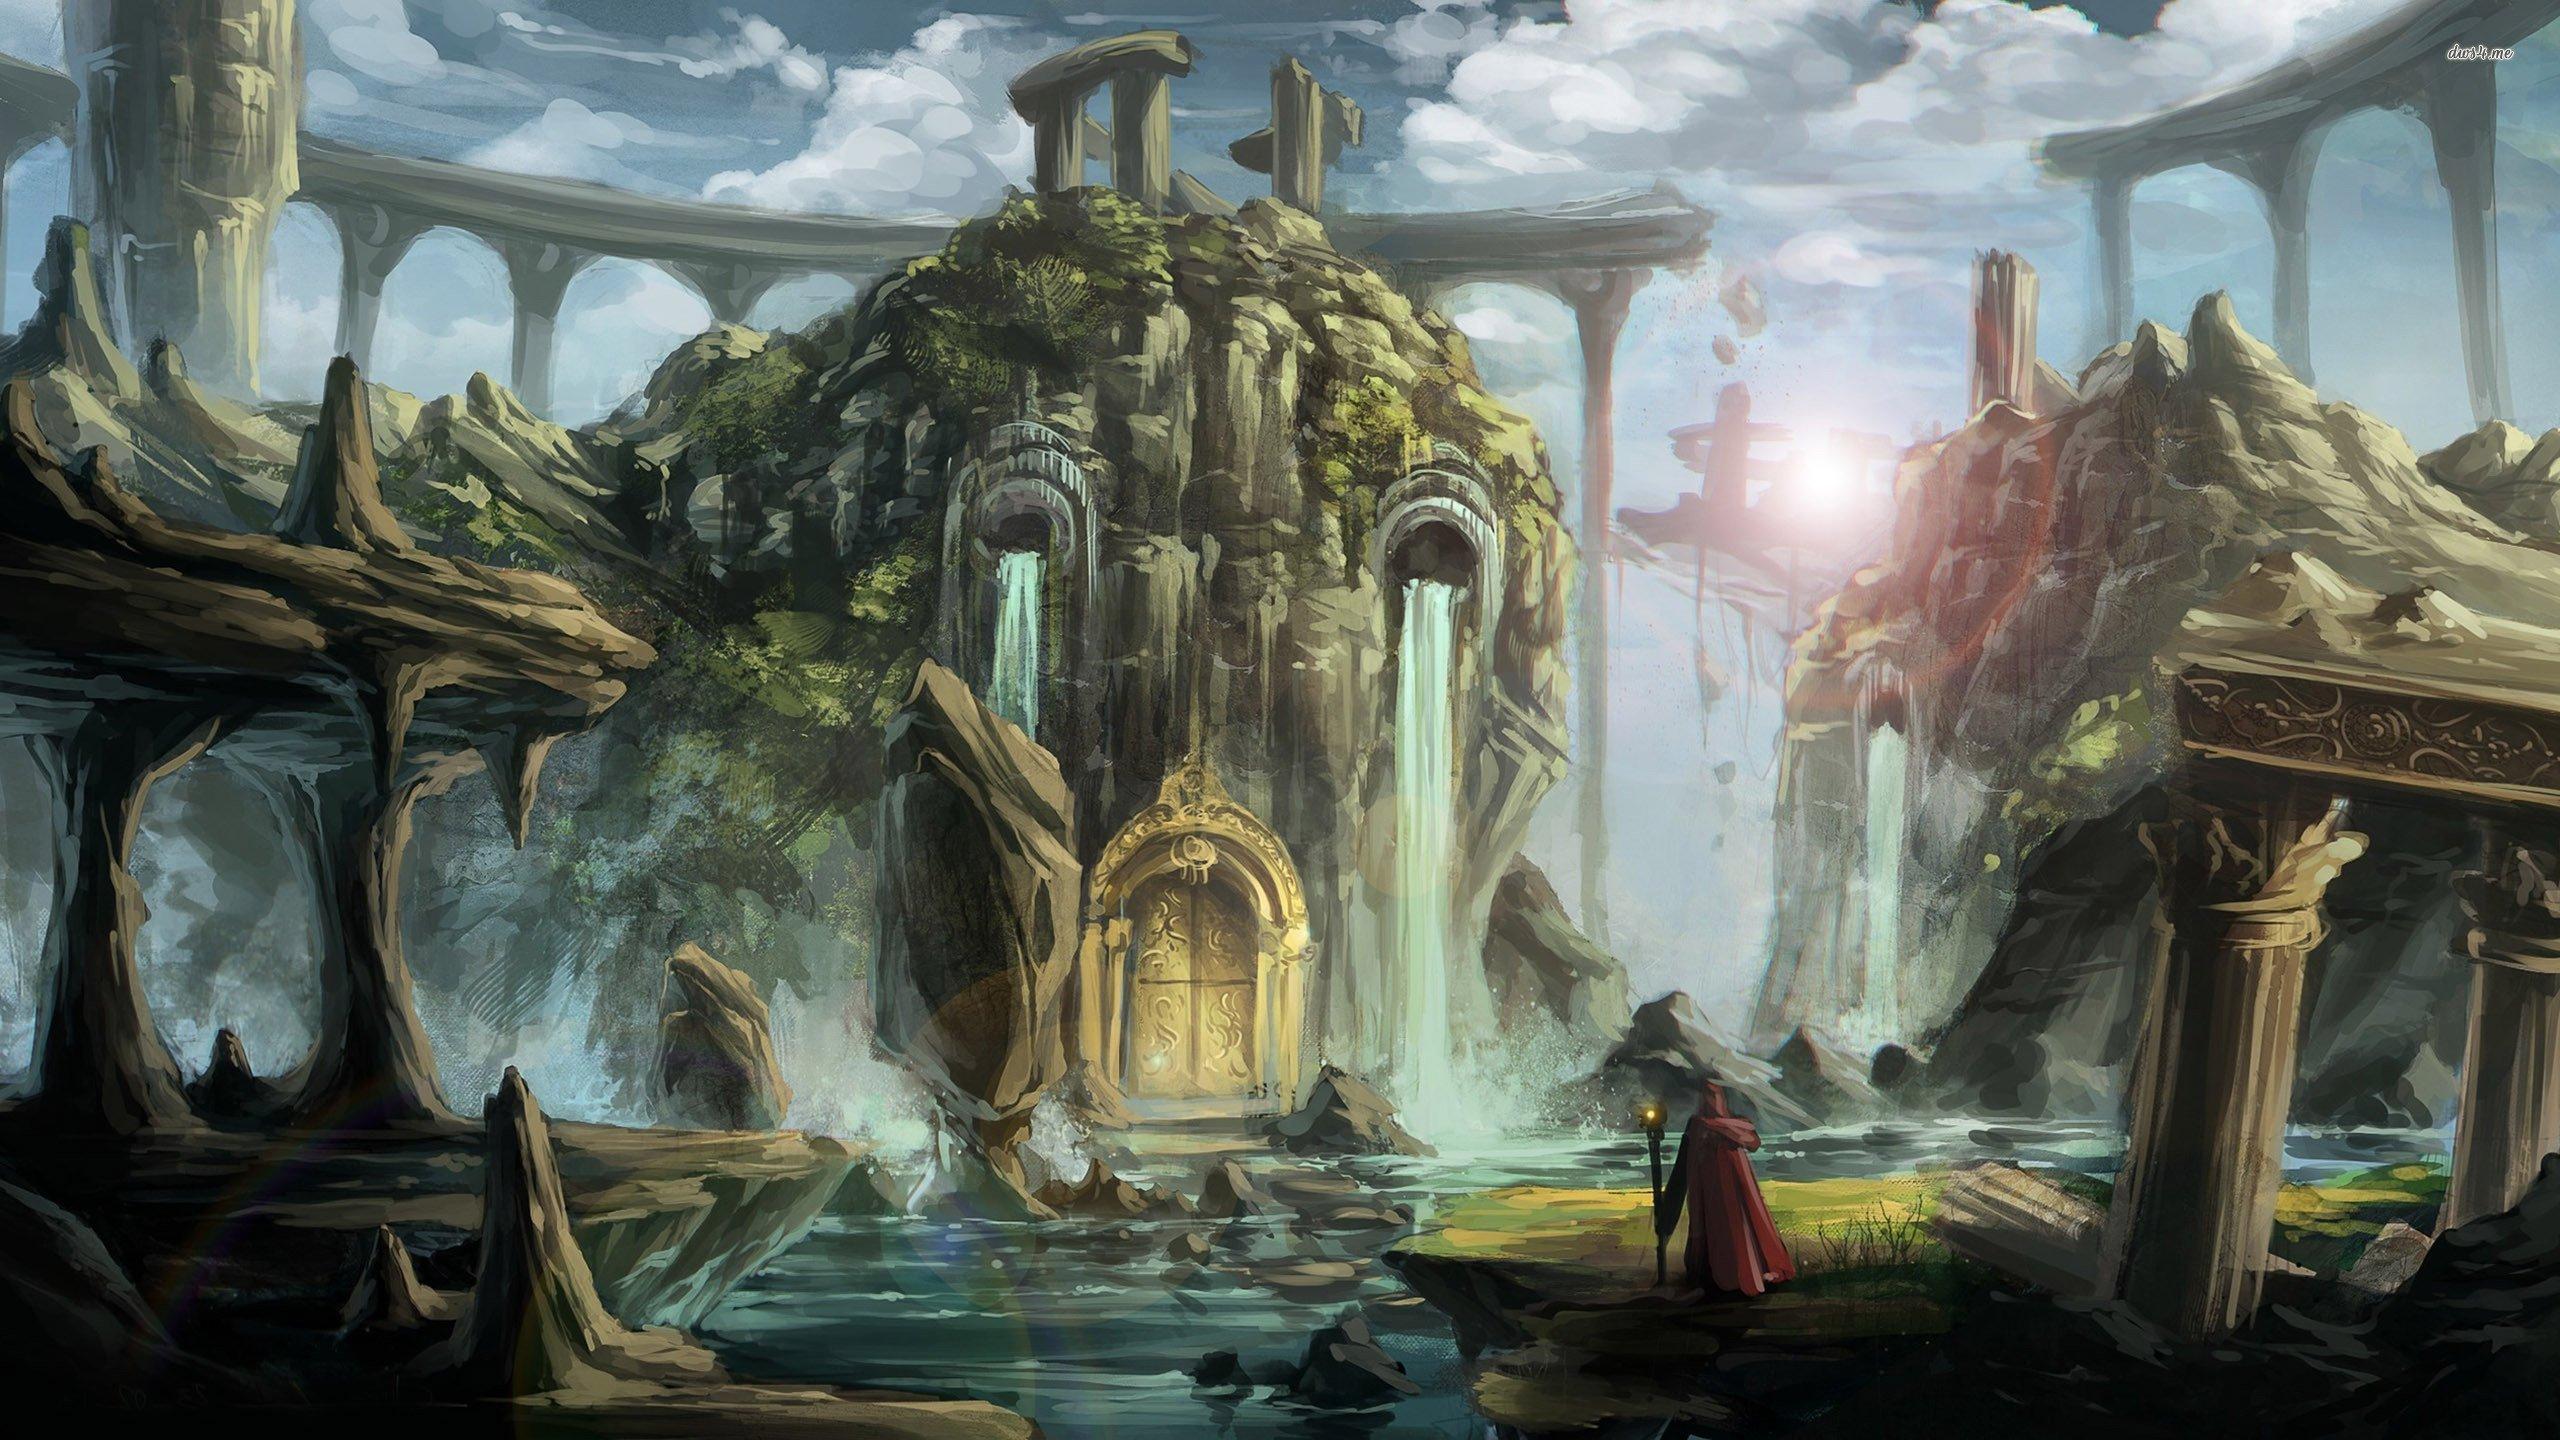 Fantasy castle wallpaper   Fantasy wallpapers   17911 2560x1440